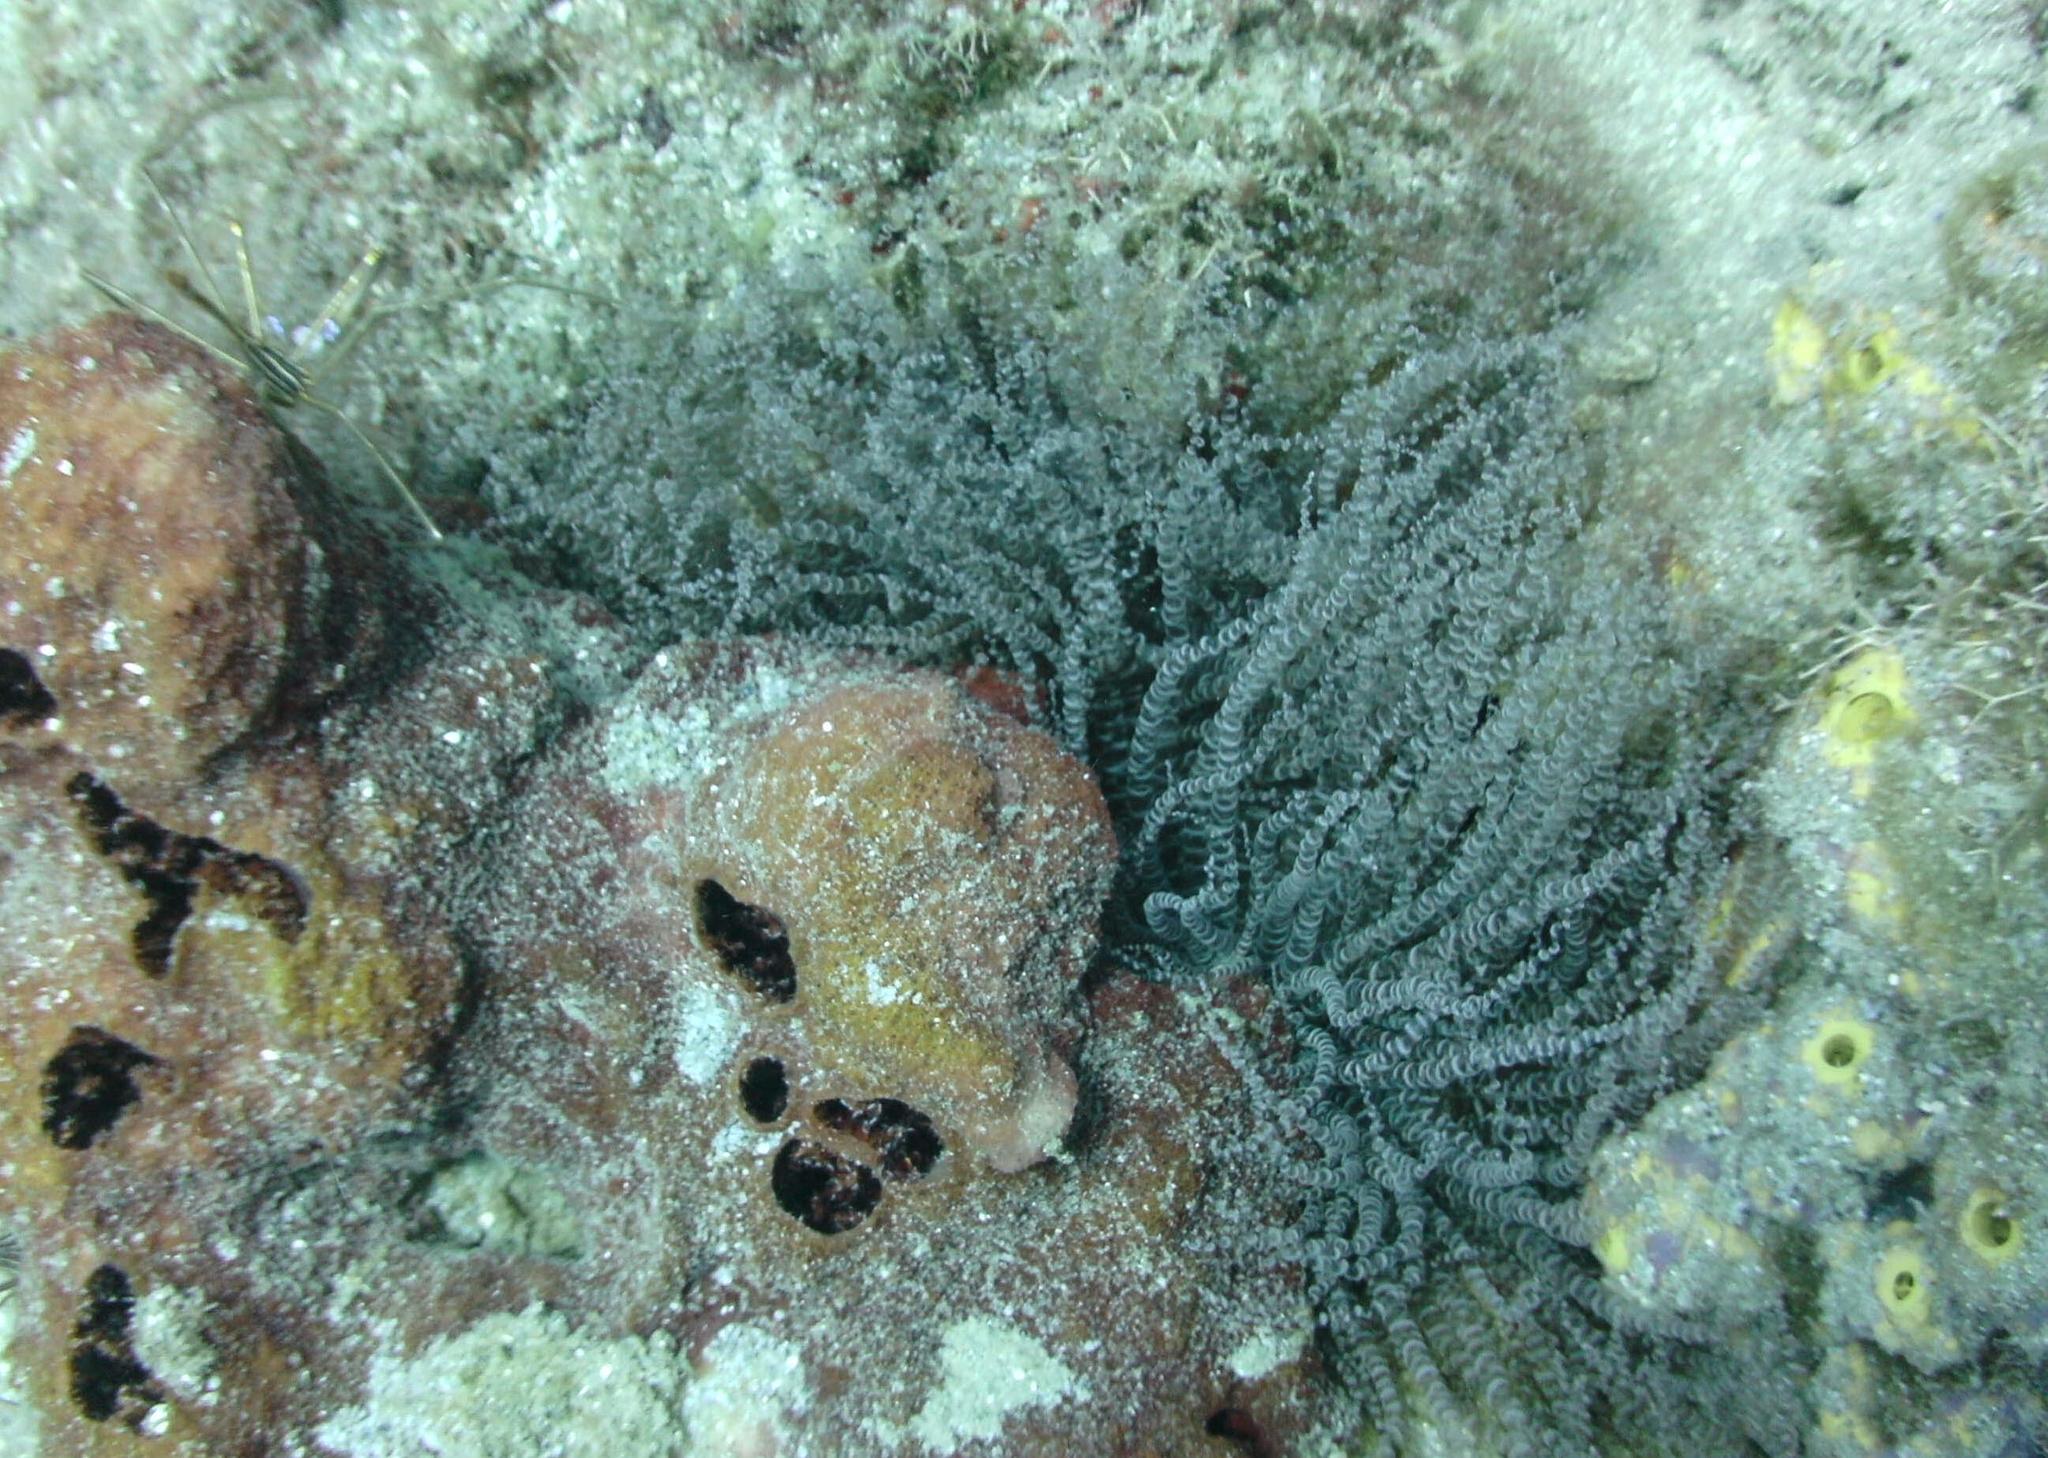 Image of ringed anemone